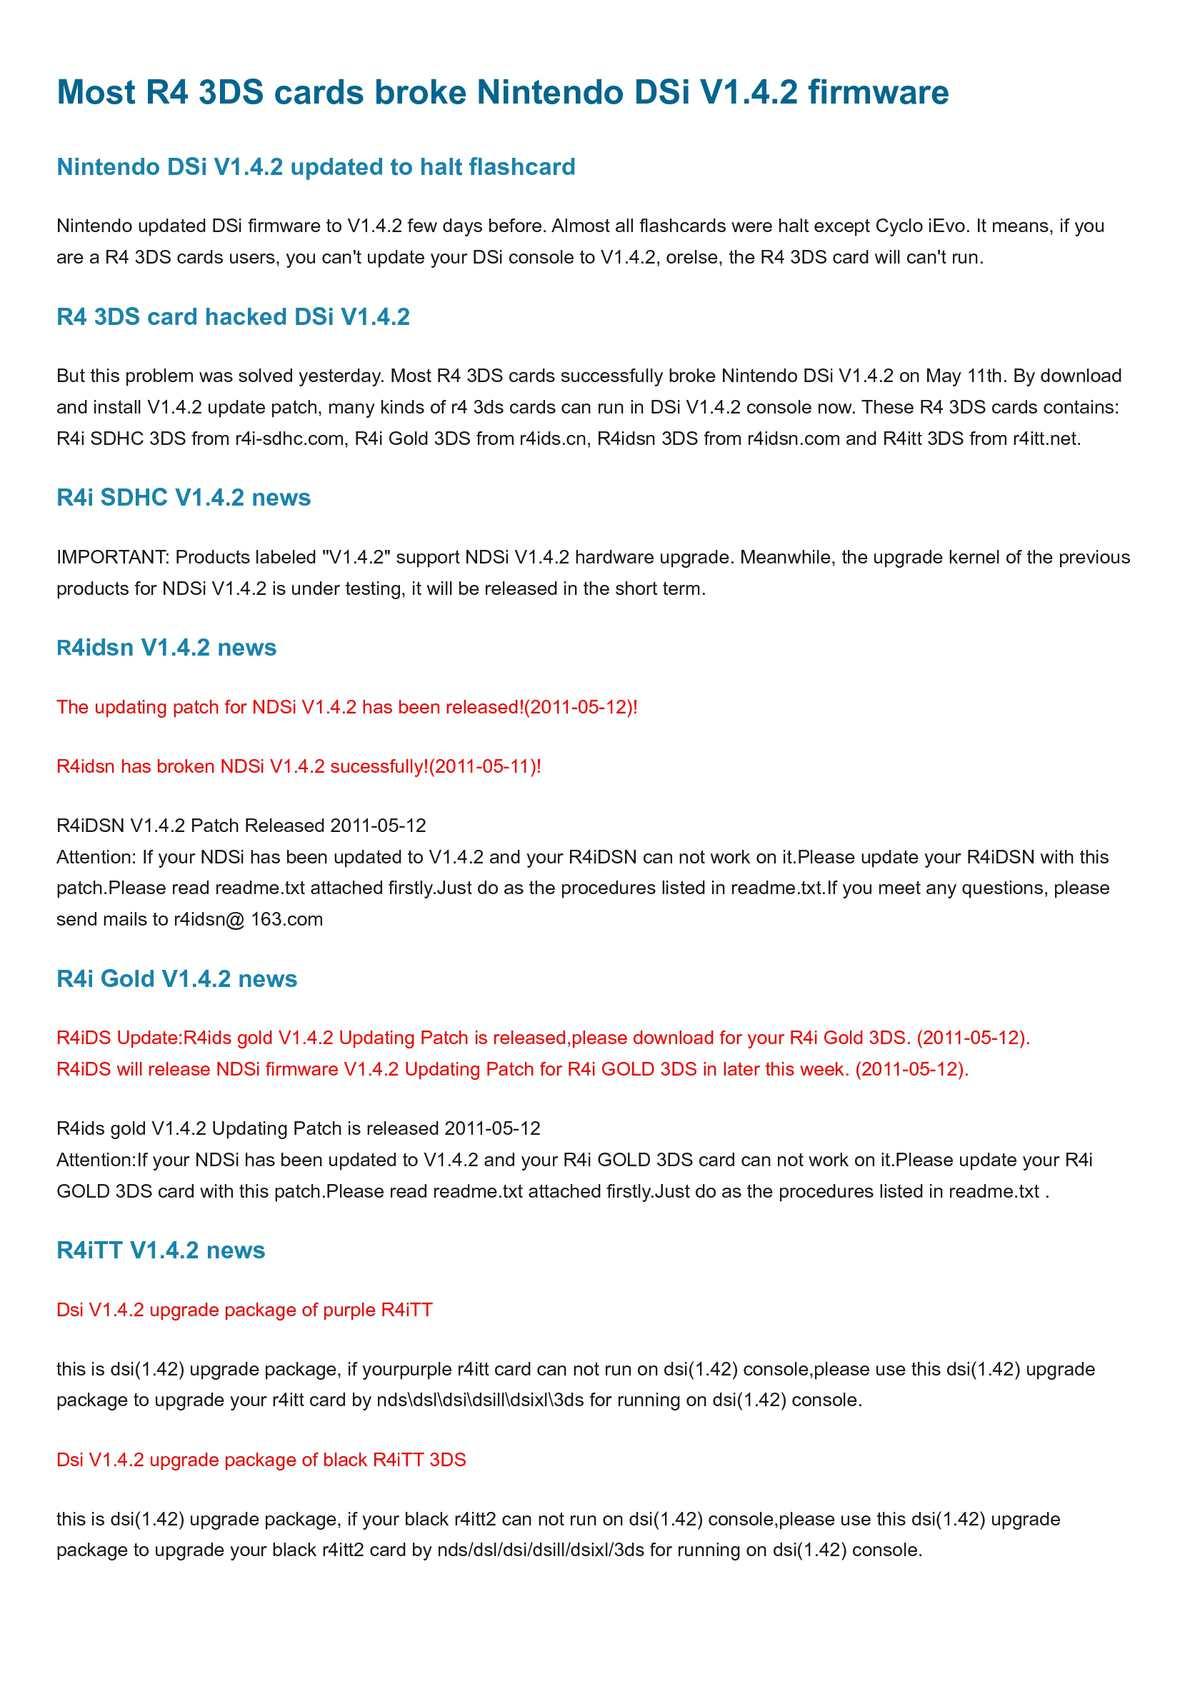 Calaméo - R4 3DS jailbreak - r4 3ds card broke dsi v1 4 2